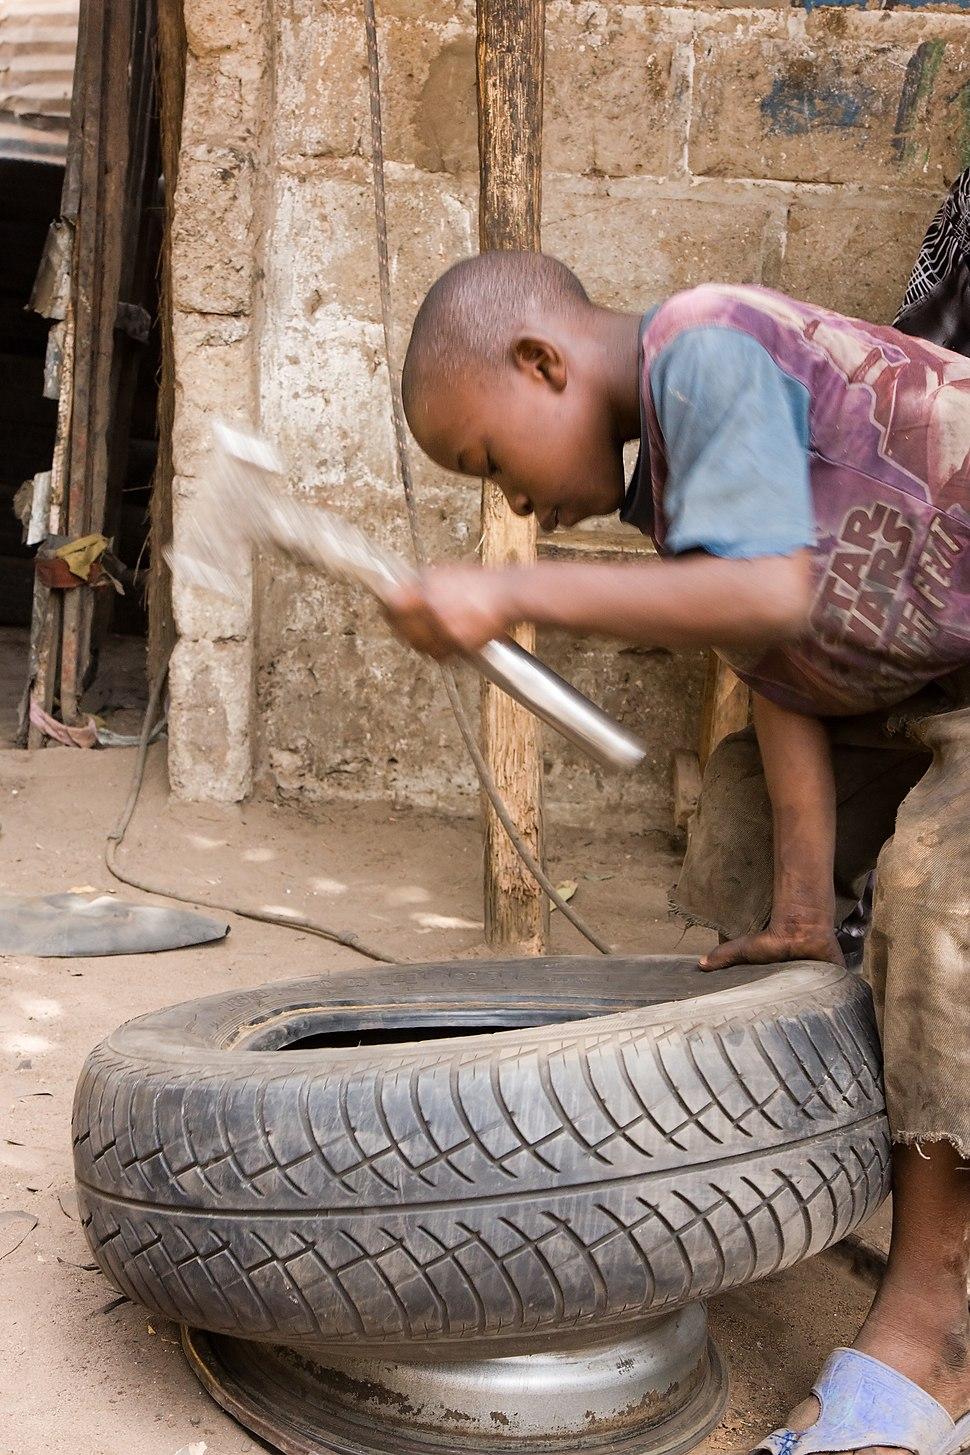 Tyre shop worker1